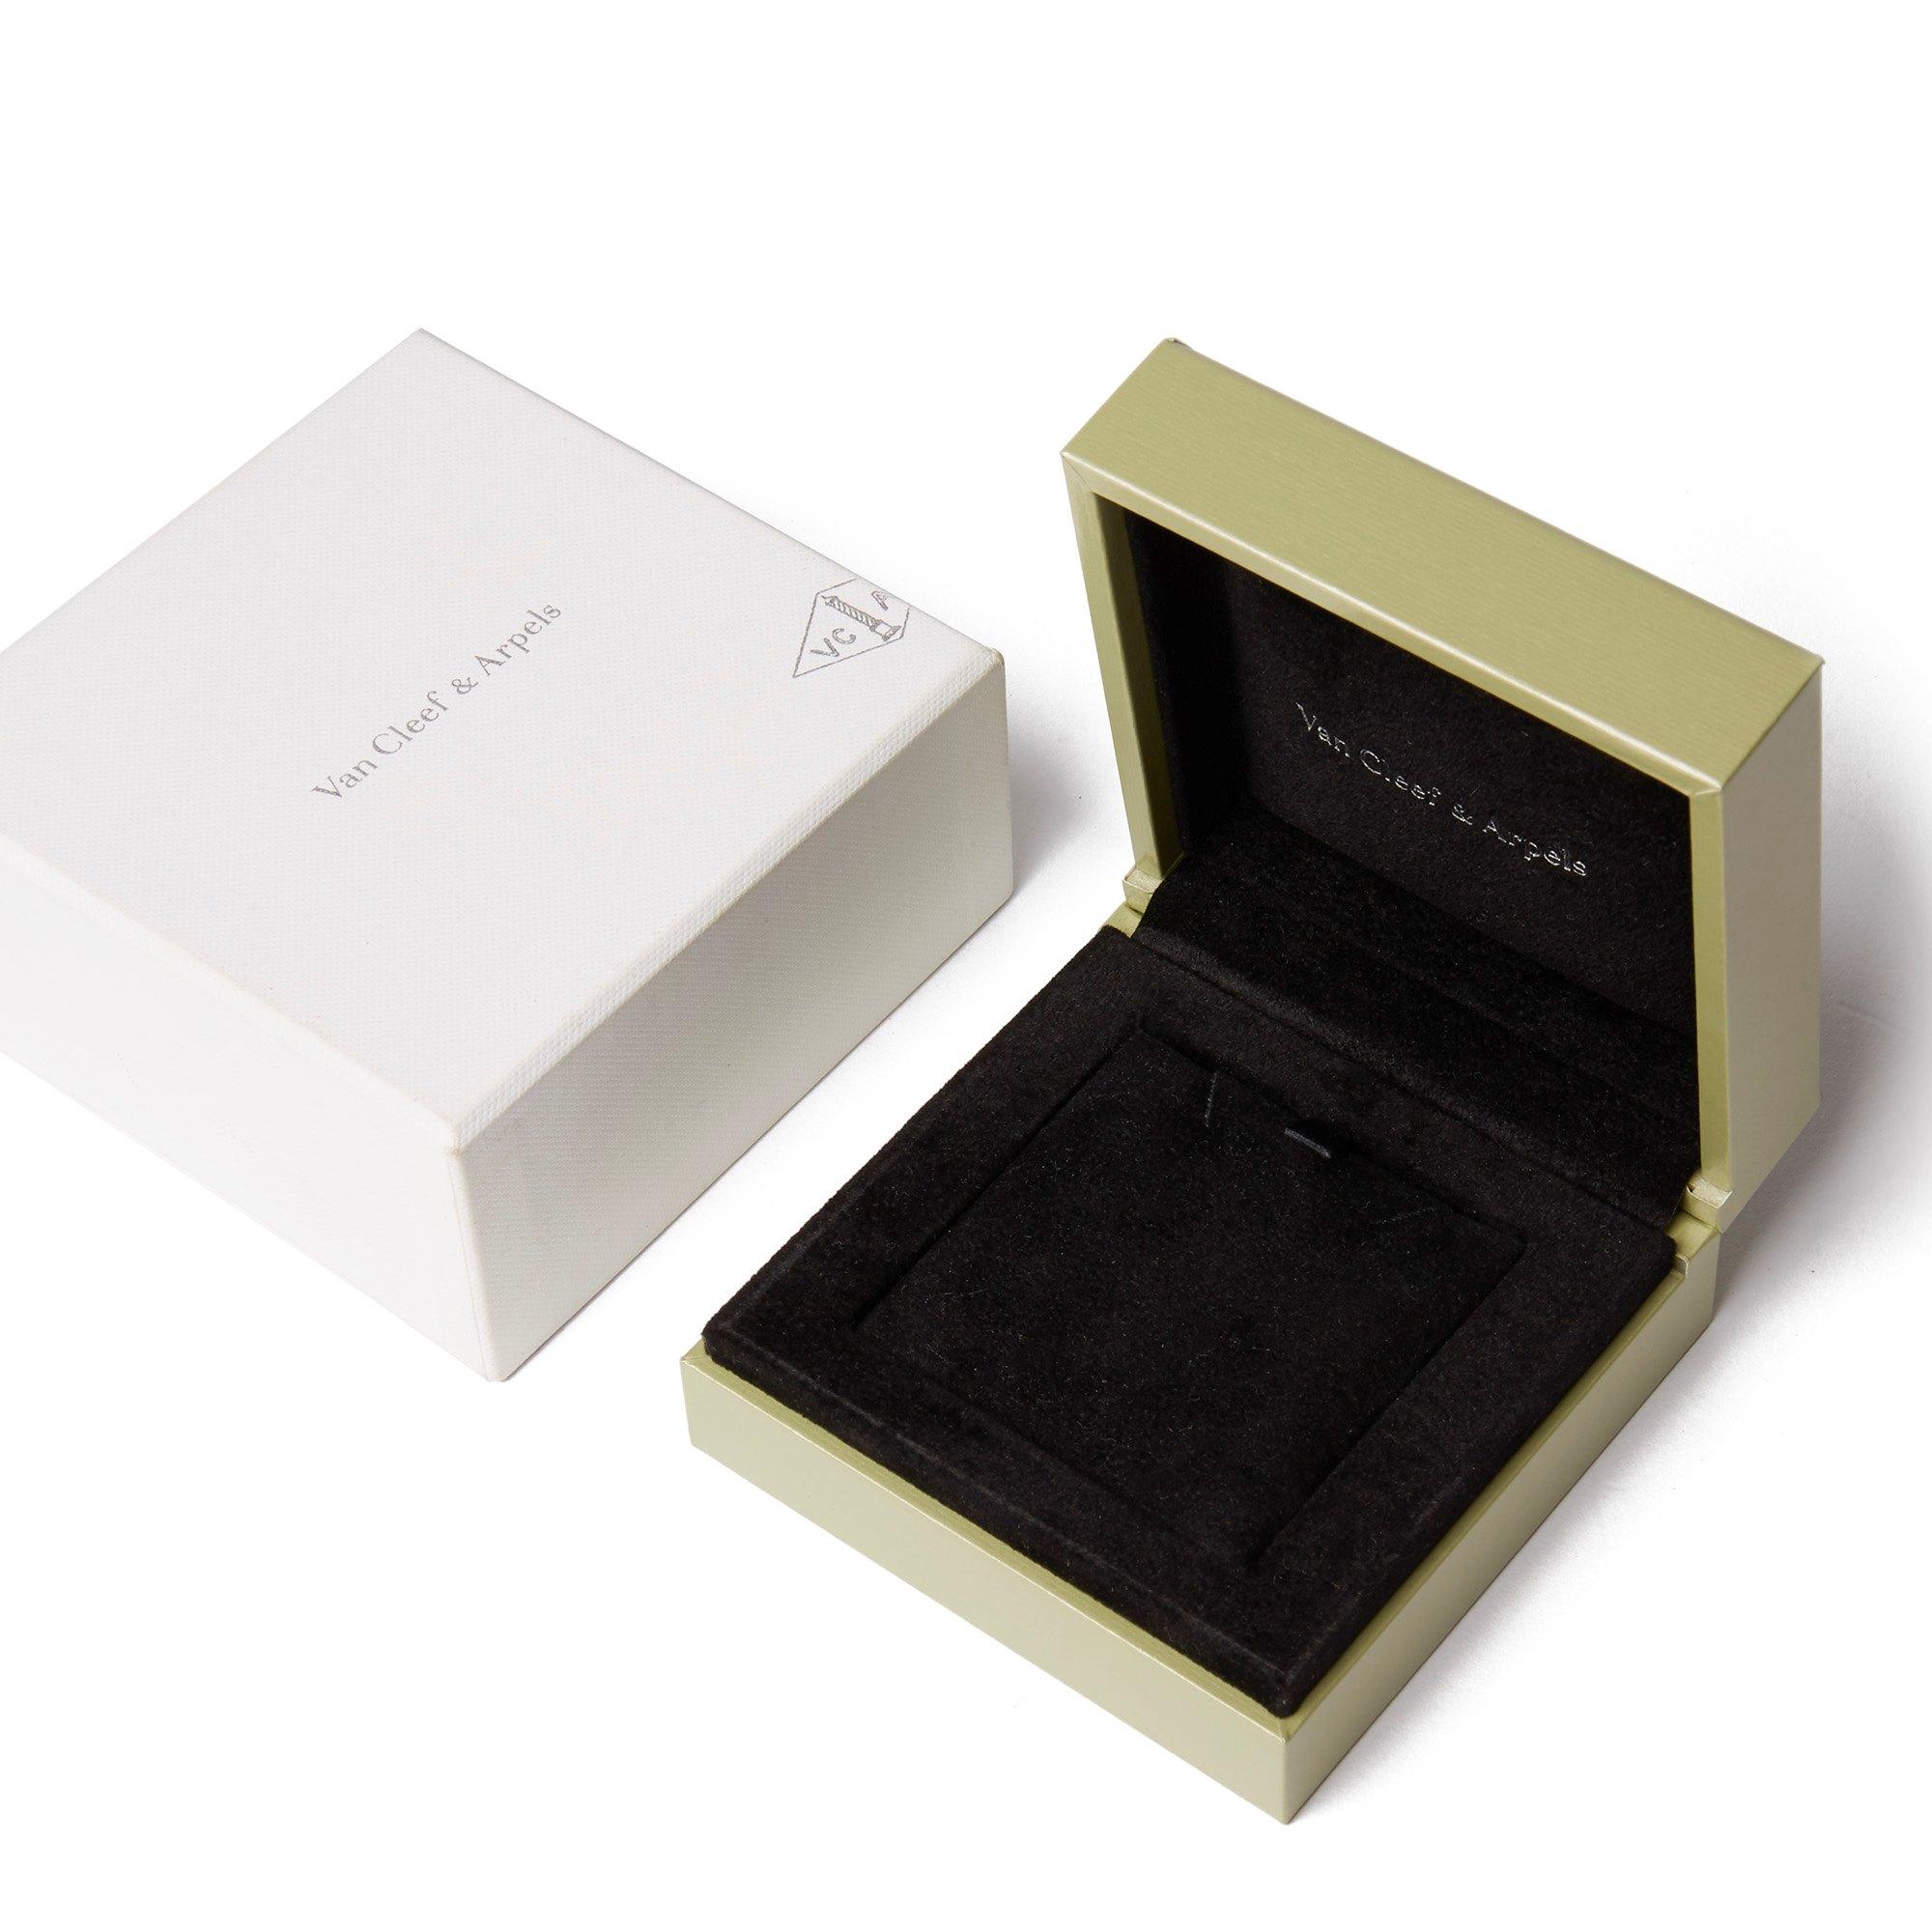 Van Cleef & Arpels 18k Yellow Gold Black Onyx Alhambra Single Pendant